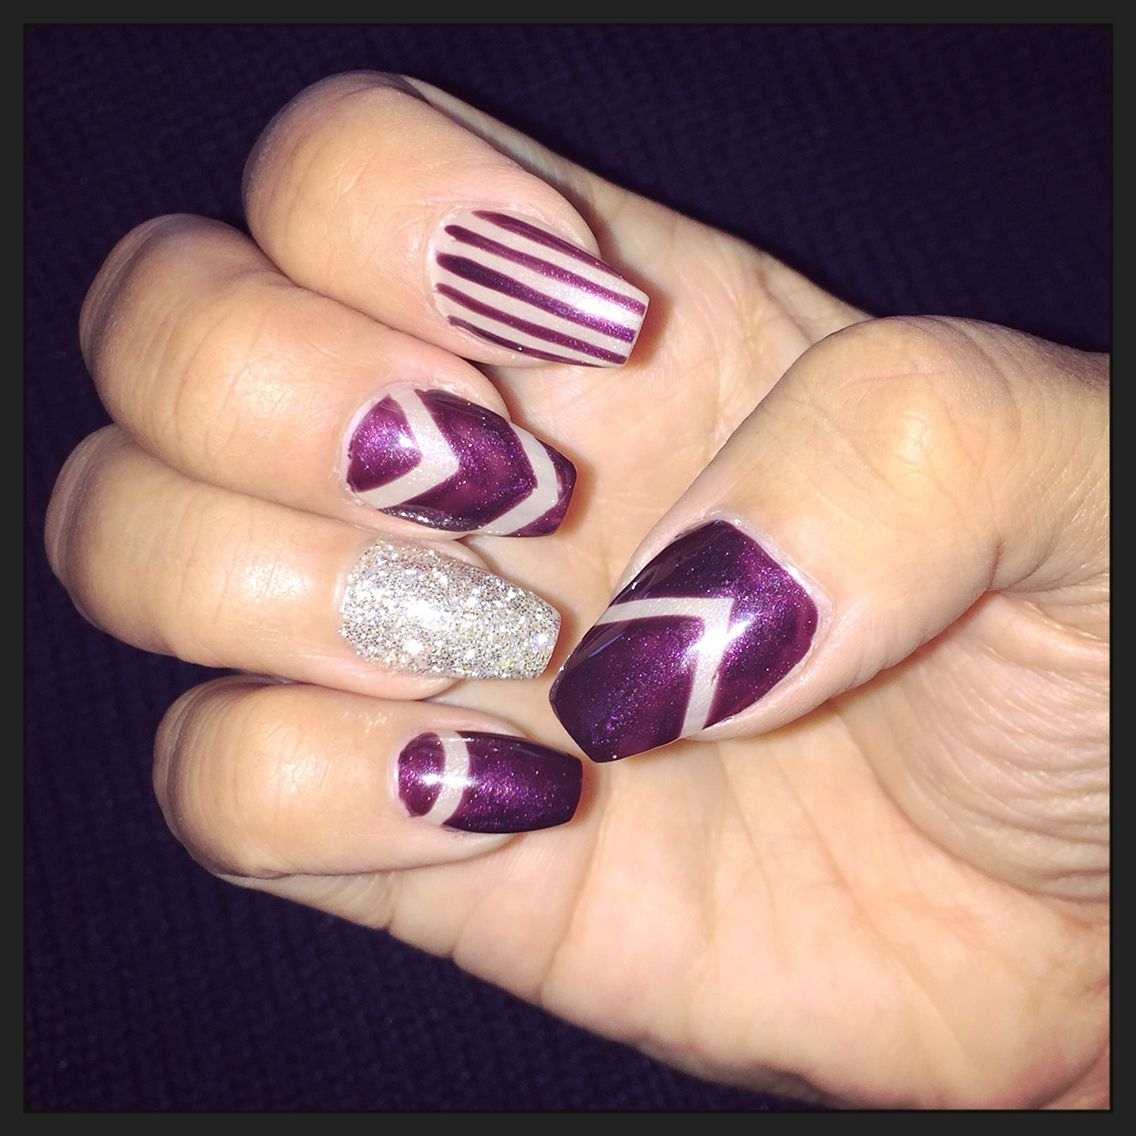 Dark fall color nails. #burgundy #nude #glitter #nailart #gellish ...